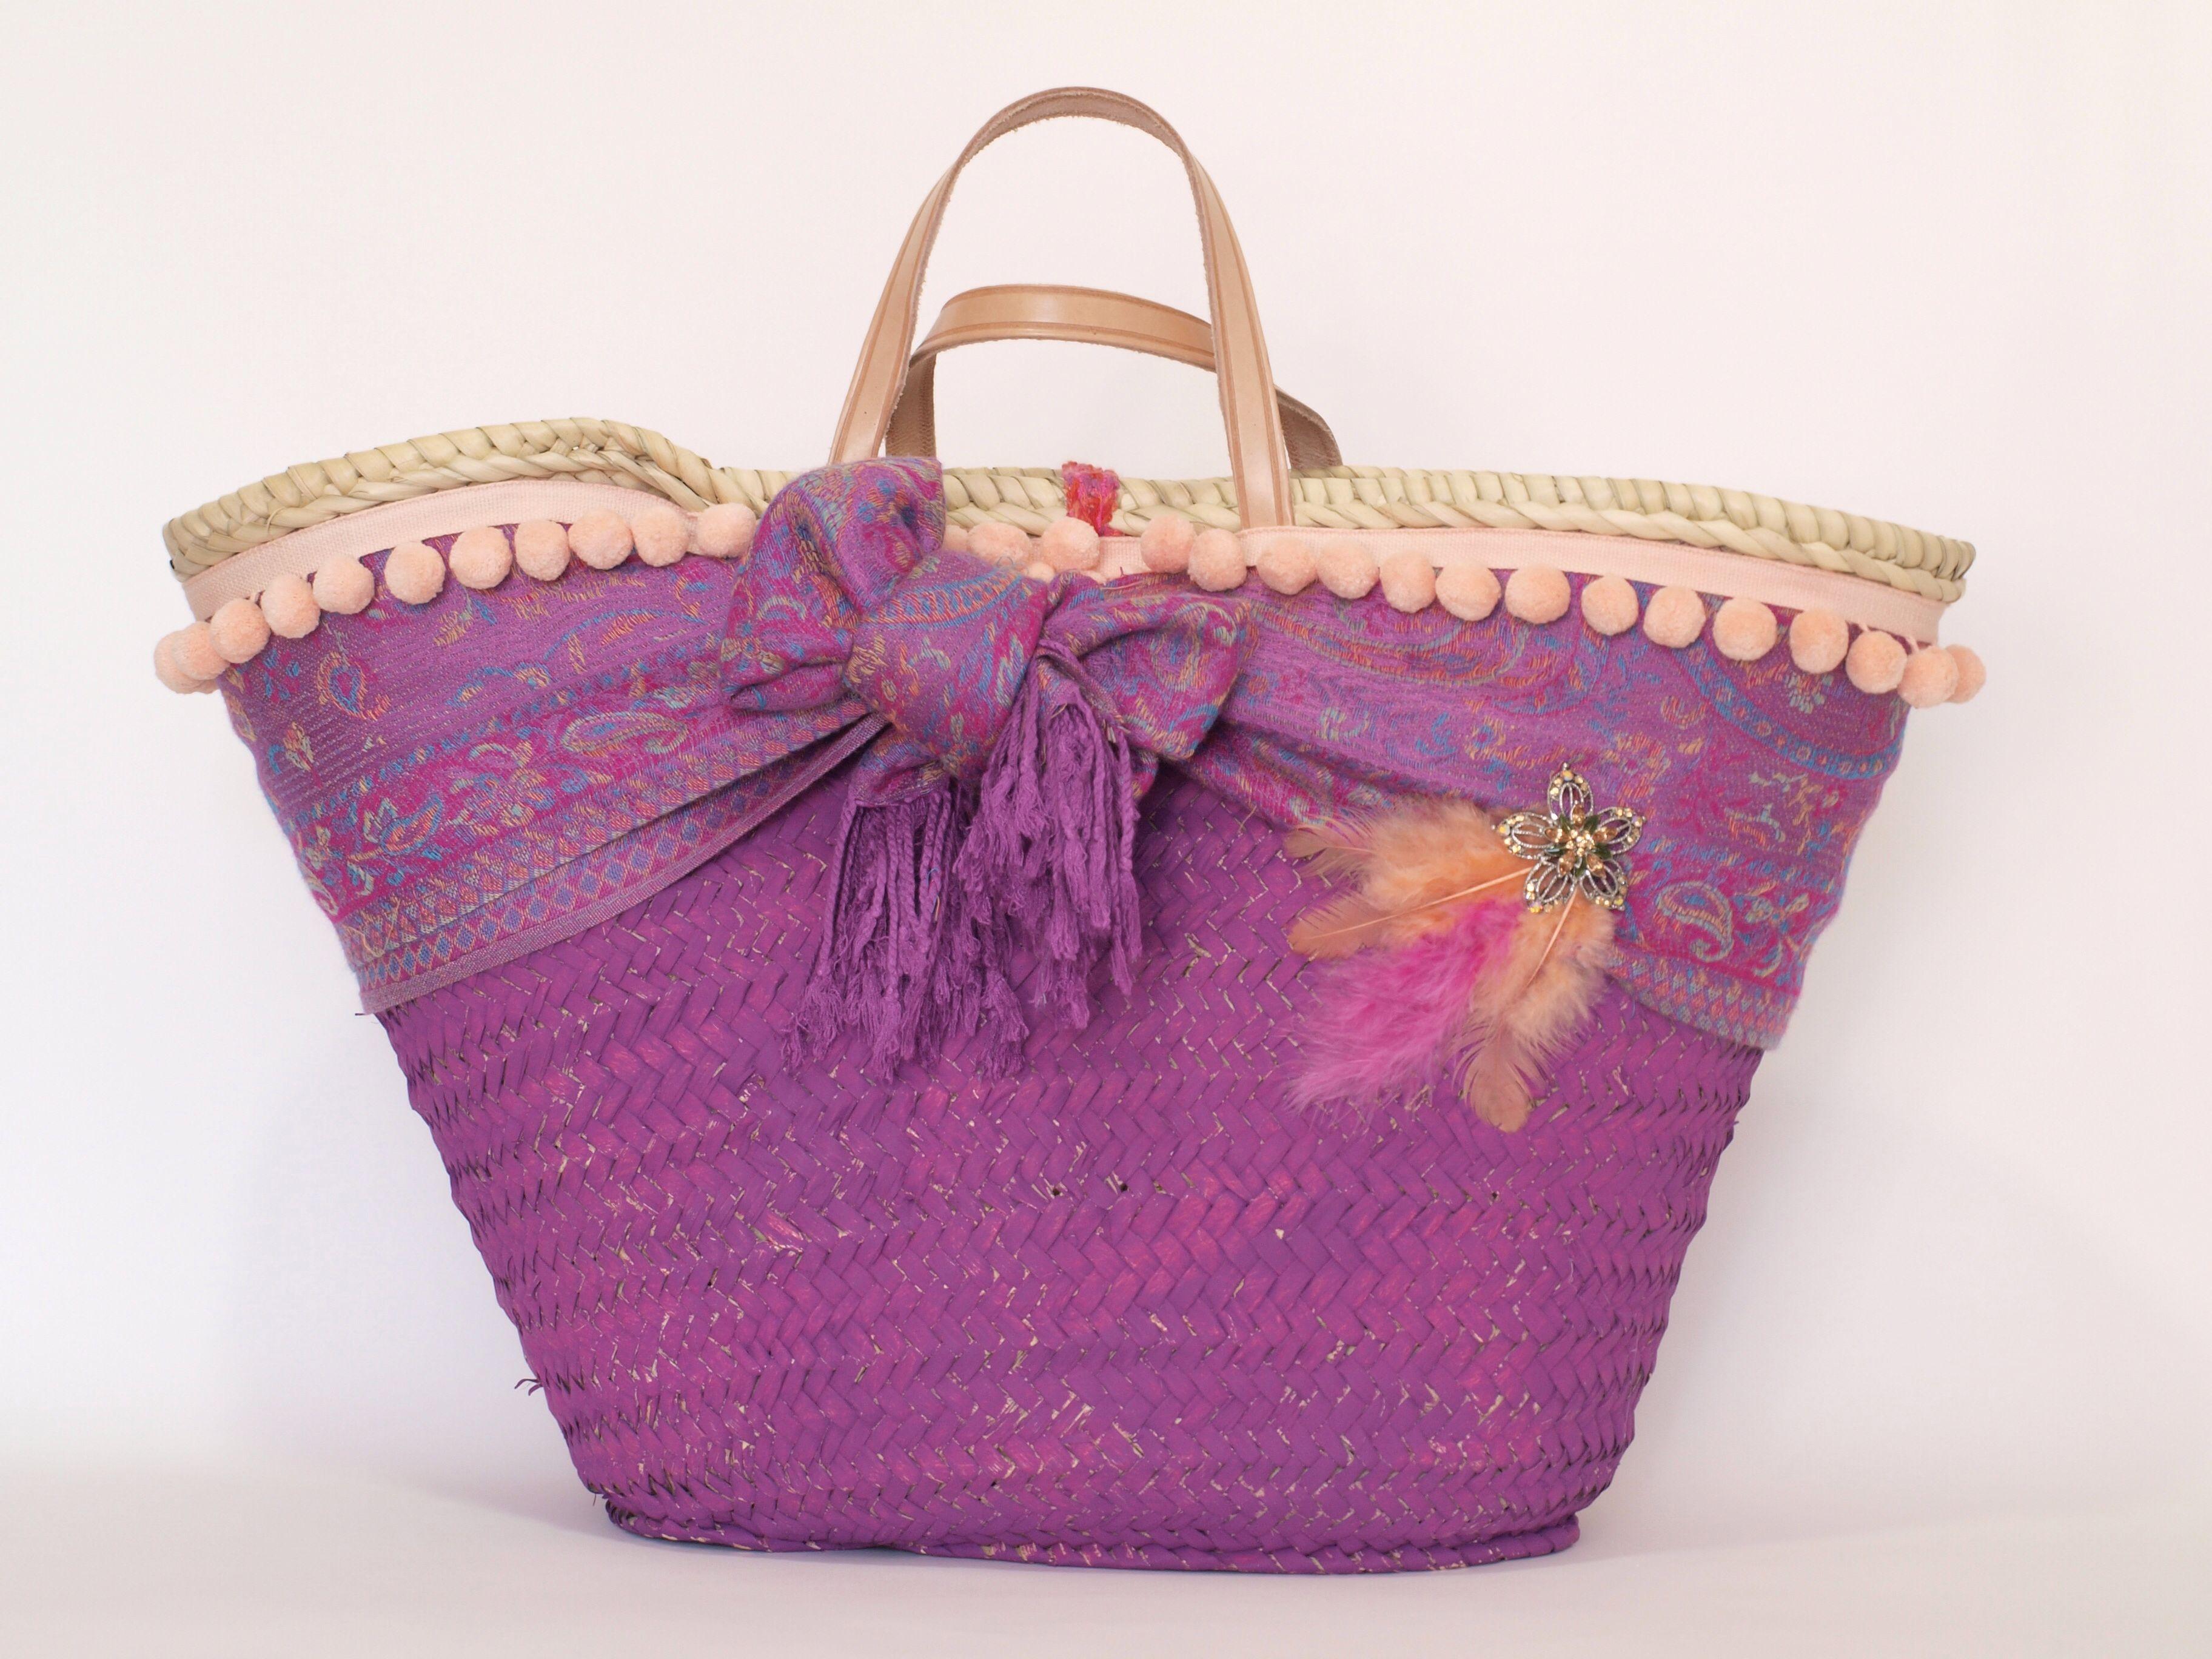 decorar con broche un bolso de mano